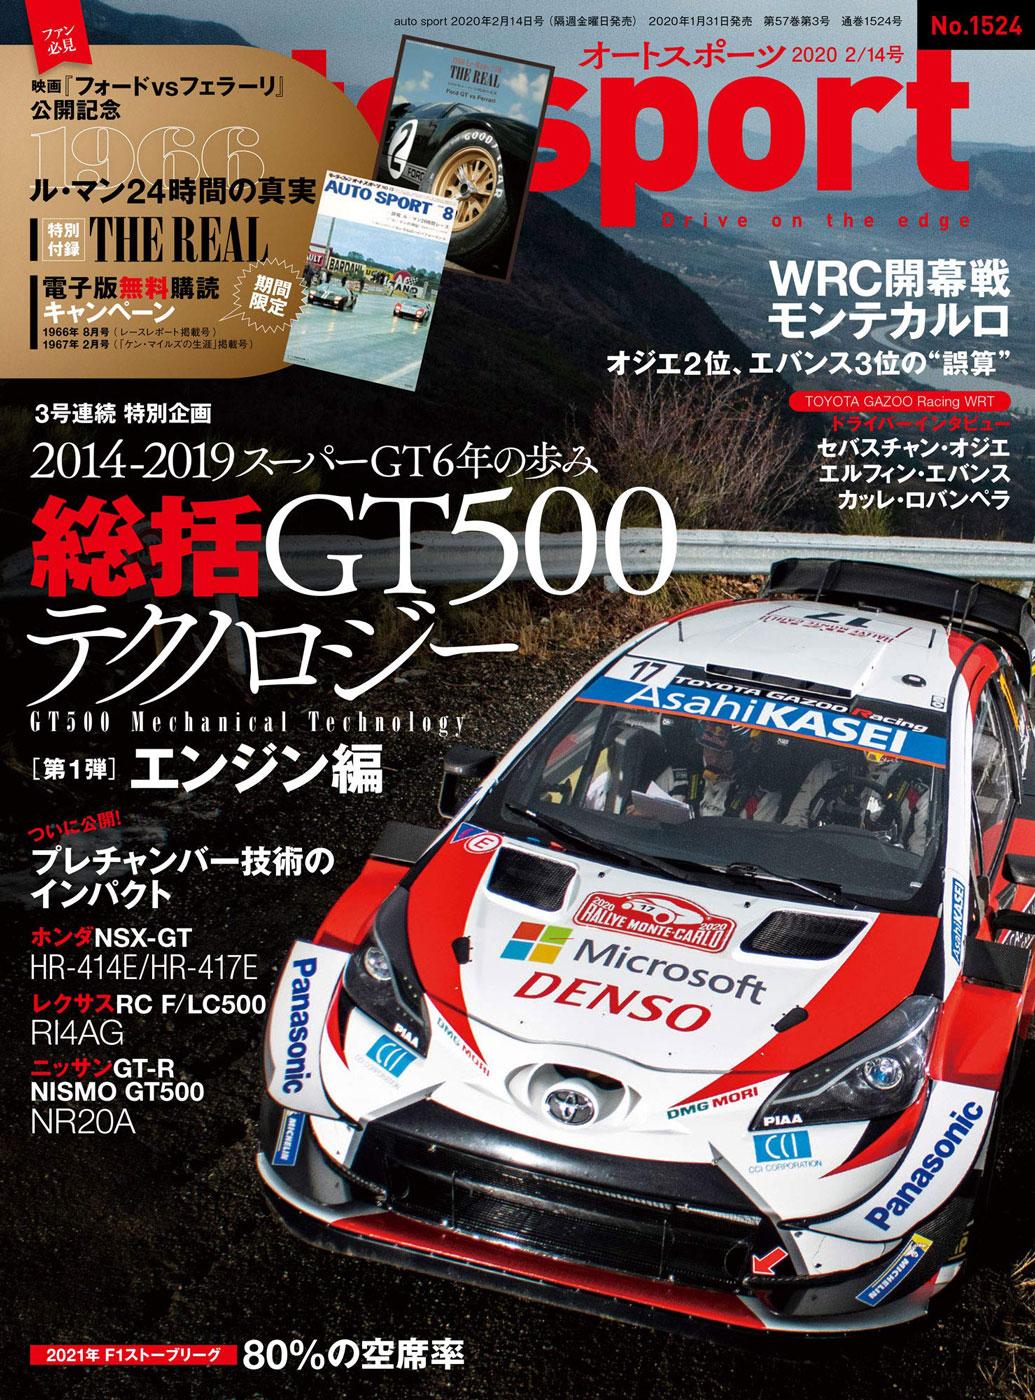 auto sport 2/14号(No.1524)2020.1.31